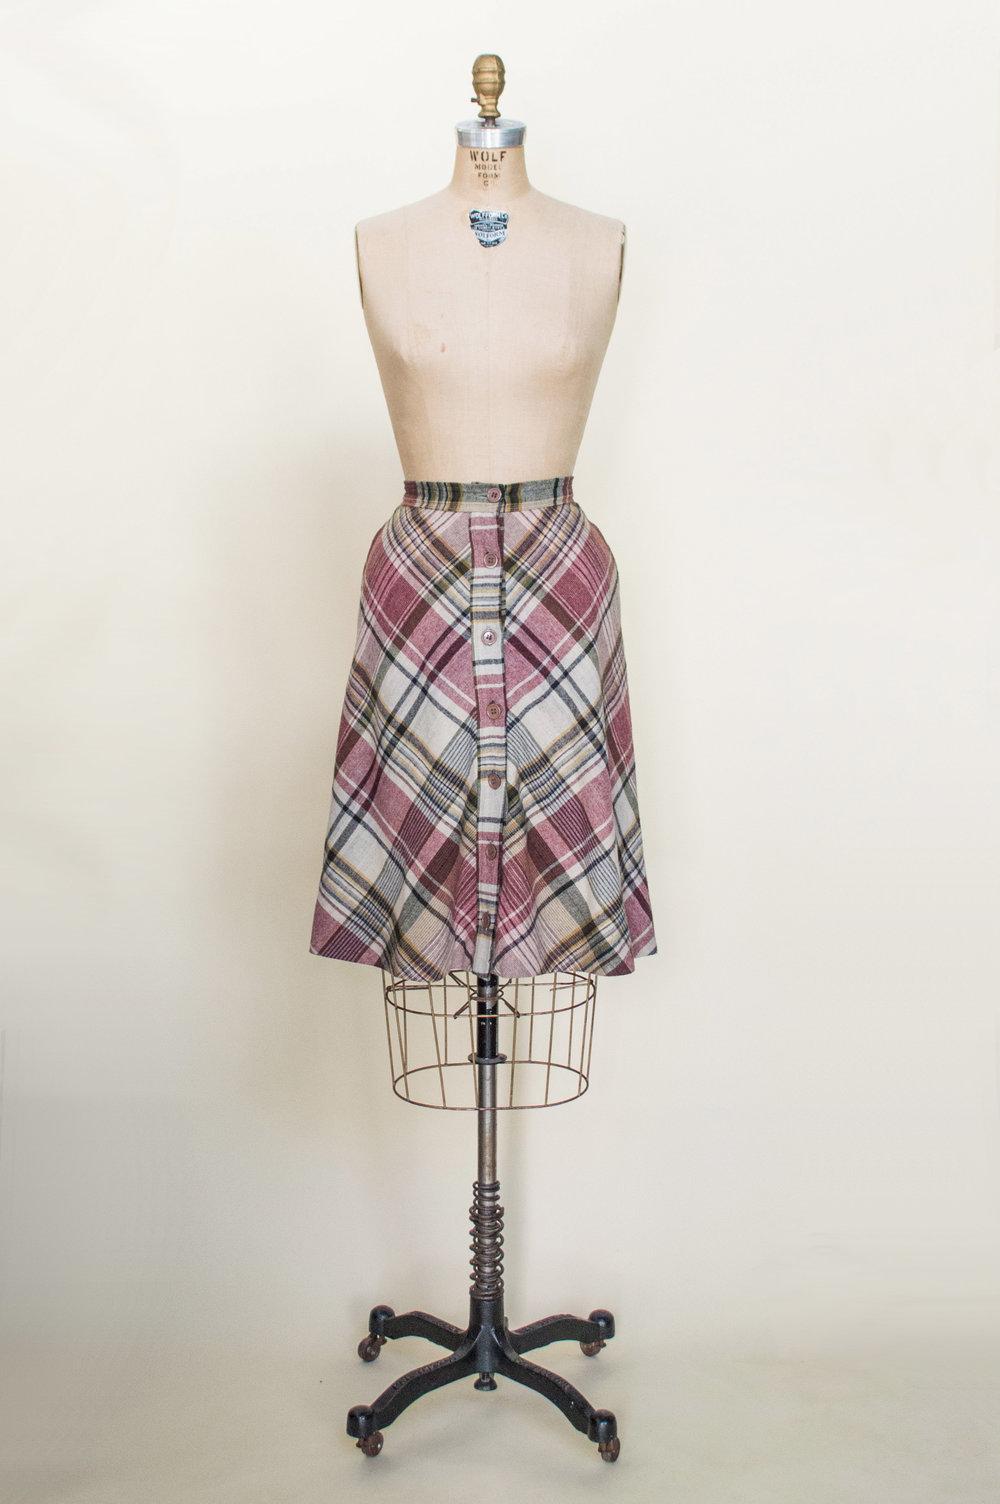 Vintage 1970's plaid skirt from Dalena Vintage